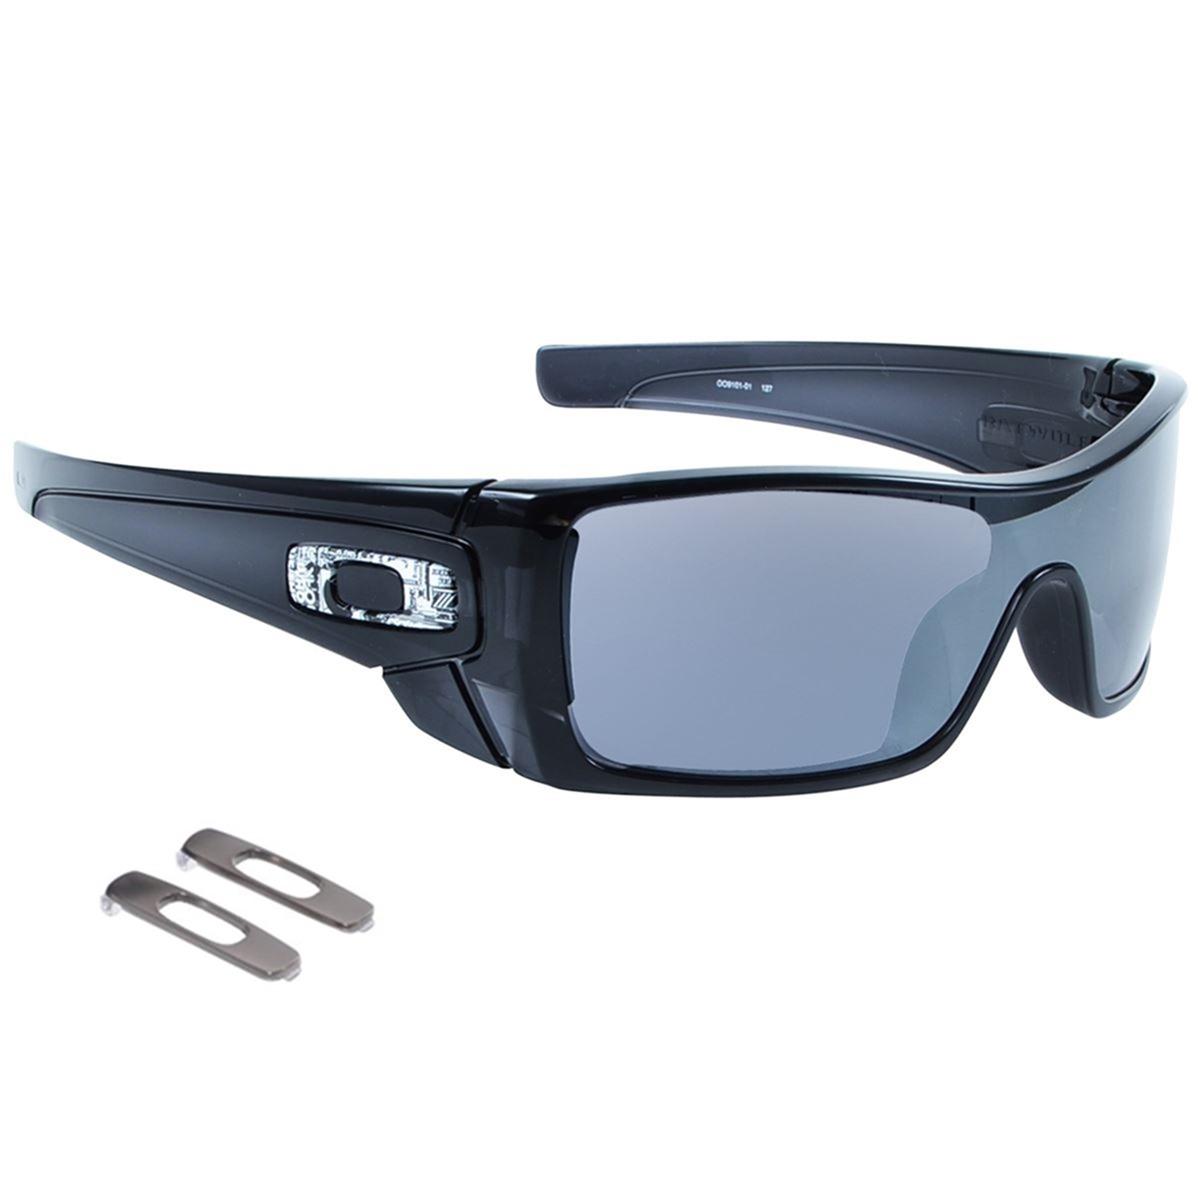 e3858c4efa6e6 óculos masculino oakley batwolf. Carregando zoom.